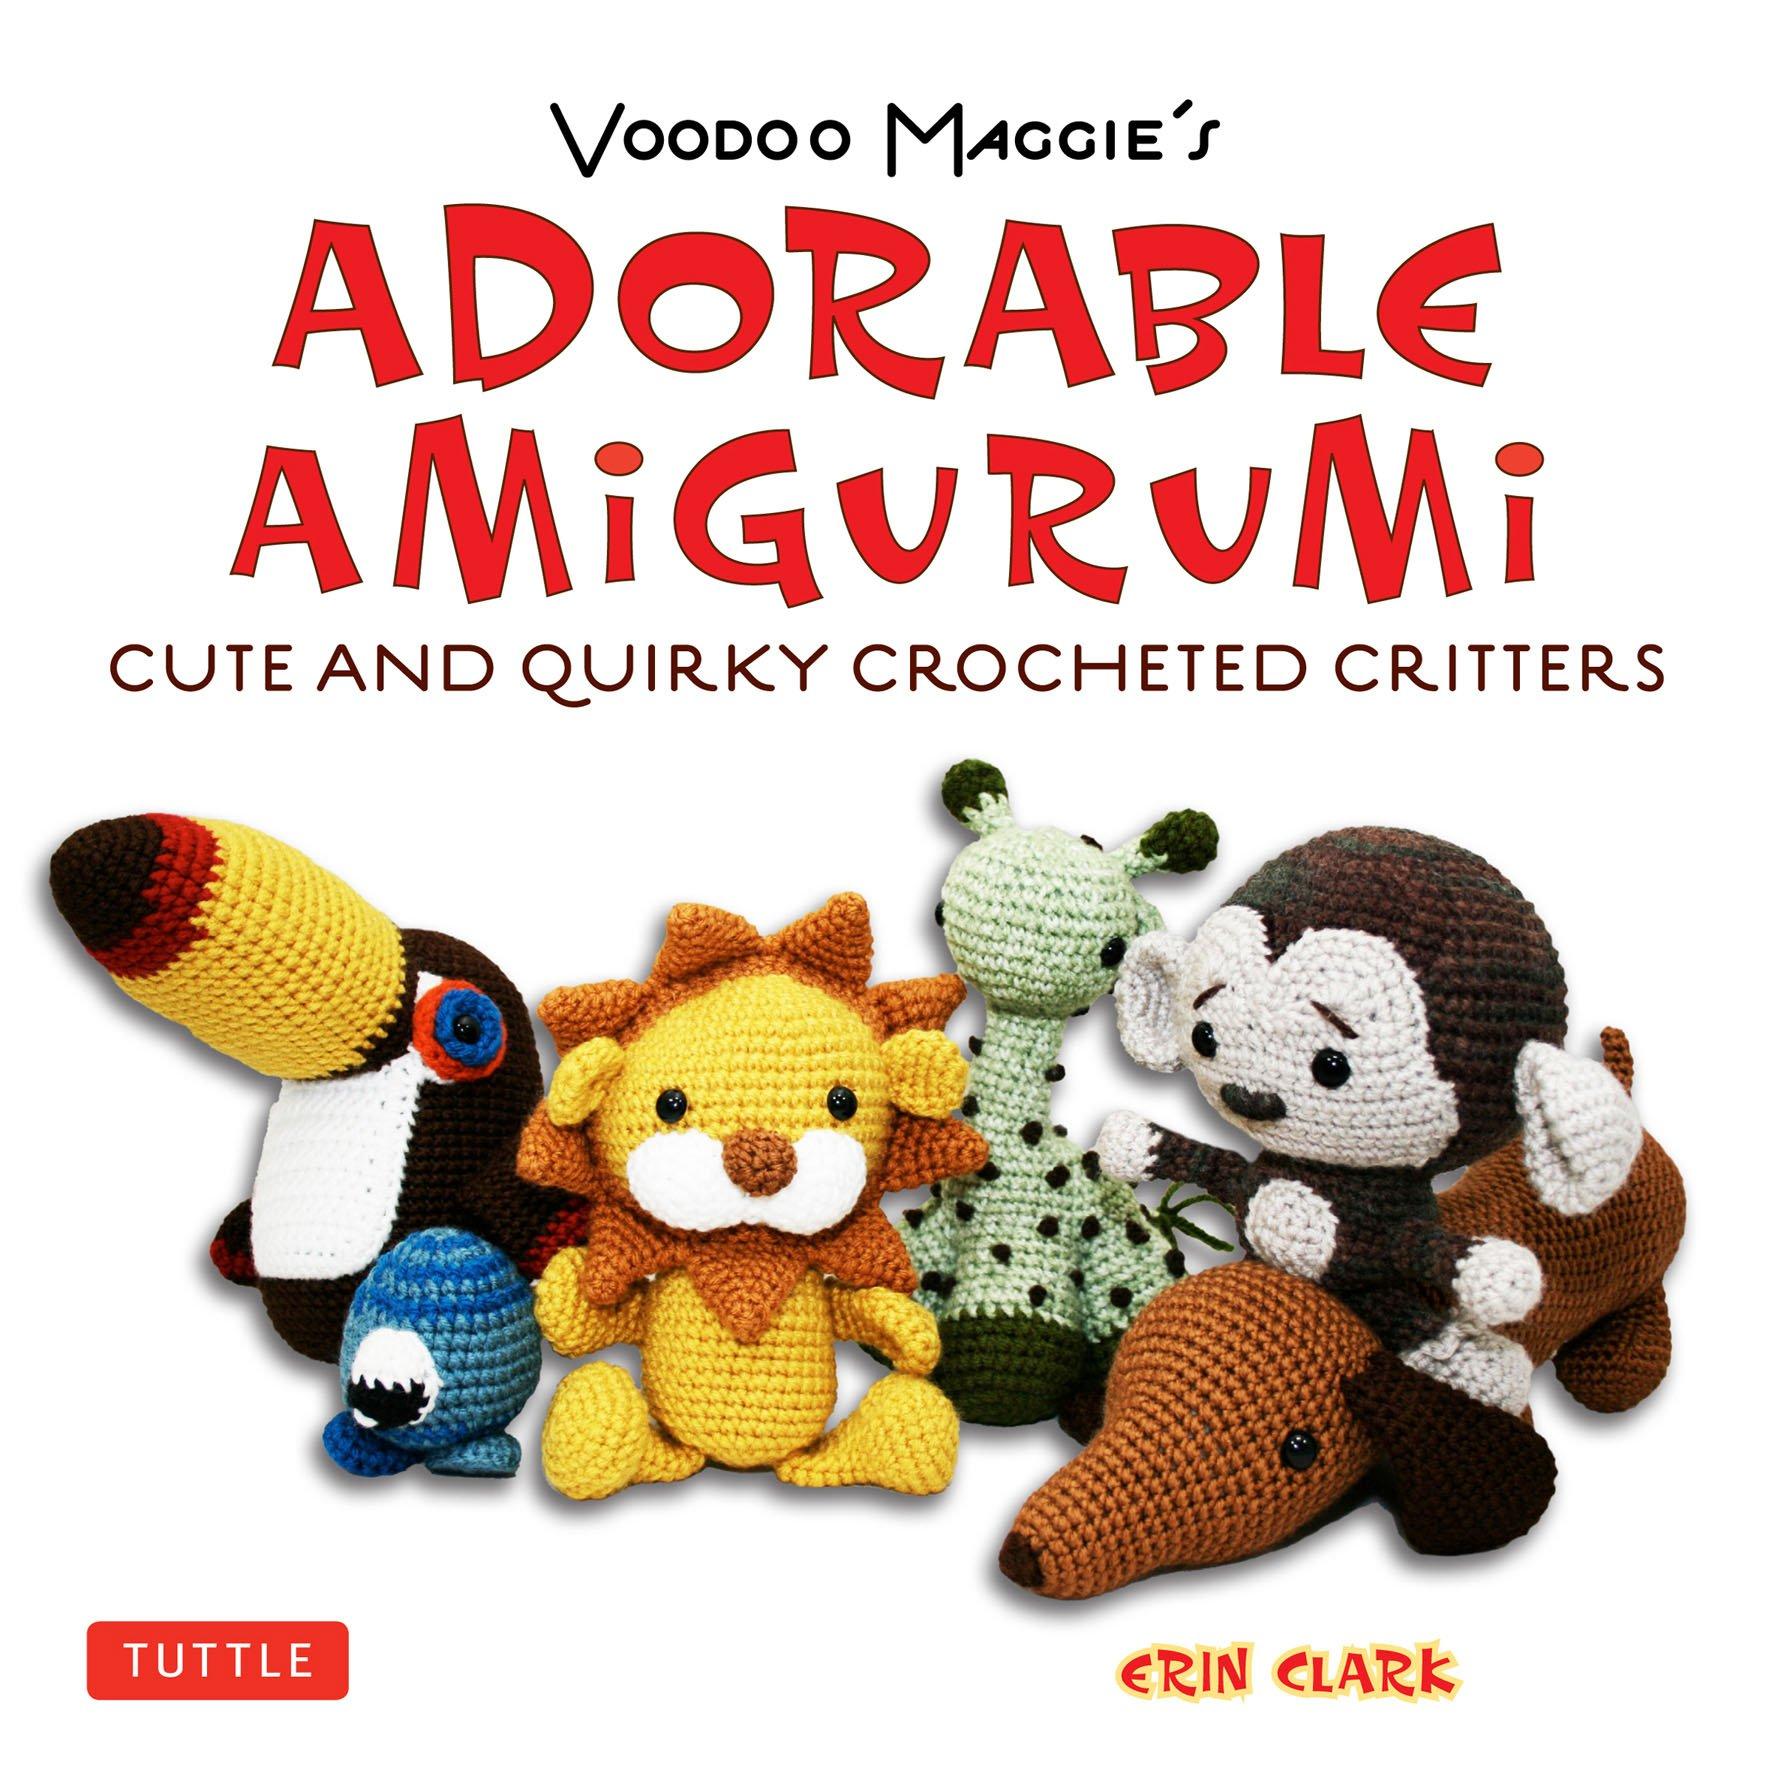 Voodoo Doll Pincushion Crochet Pattern   Supergurumi   1769x1772